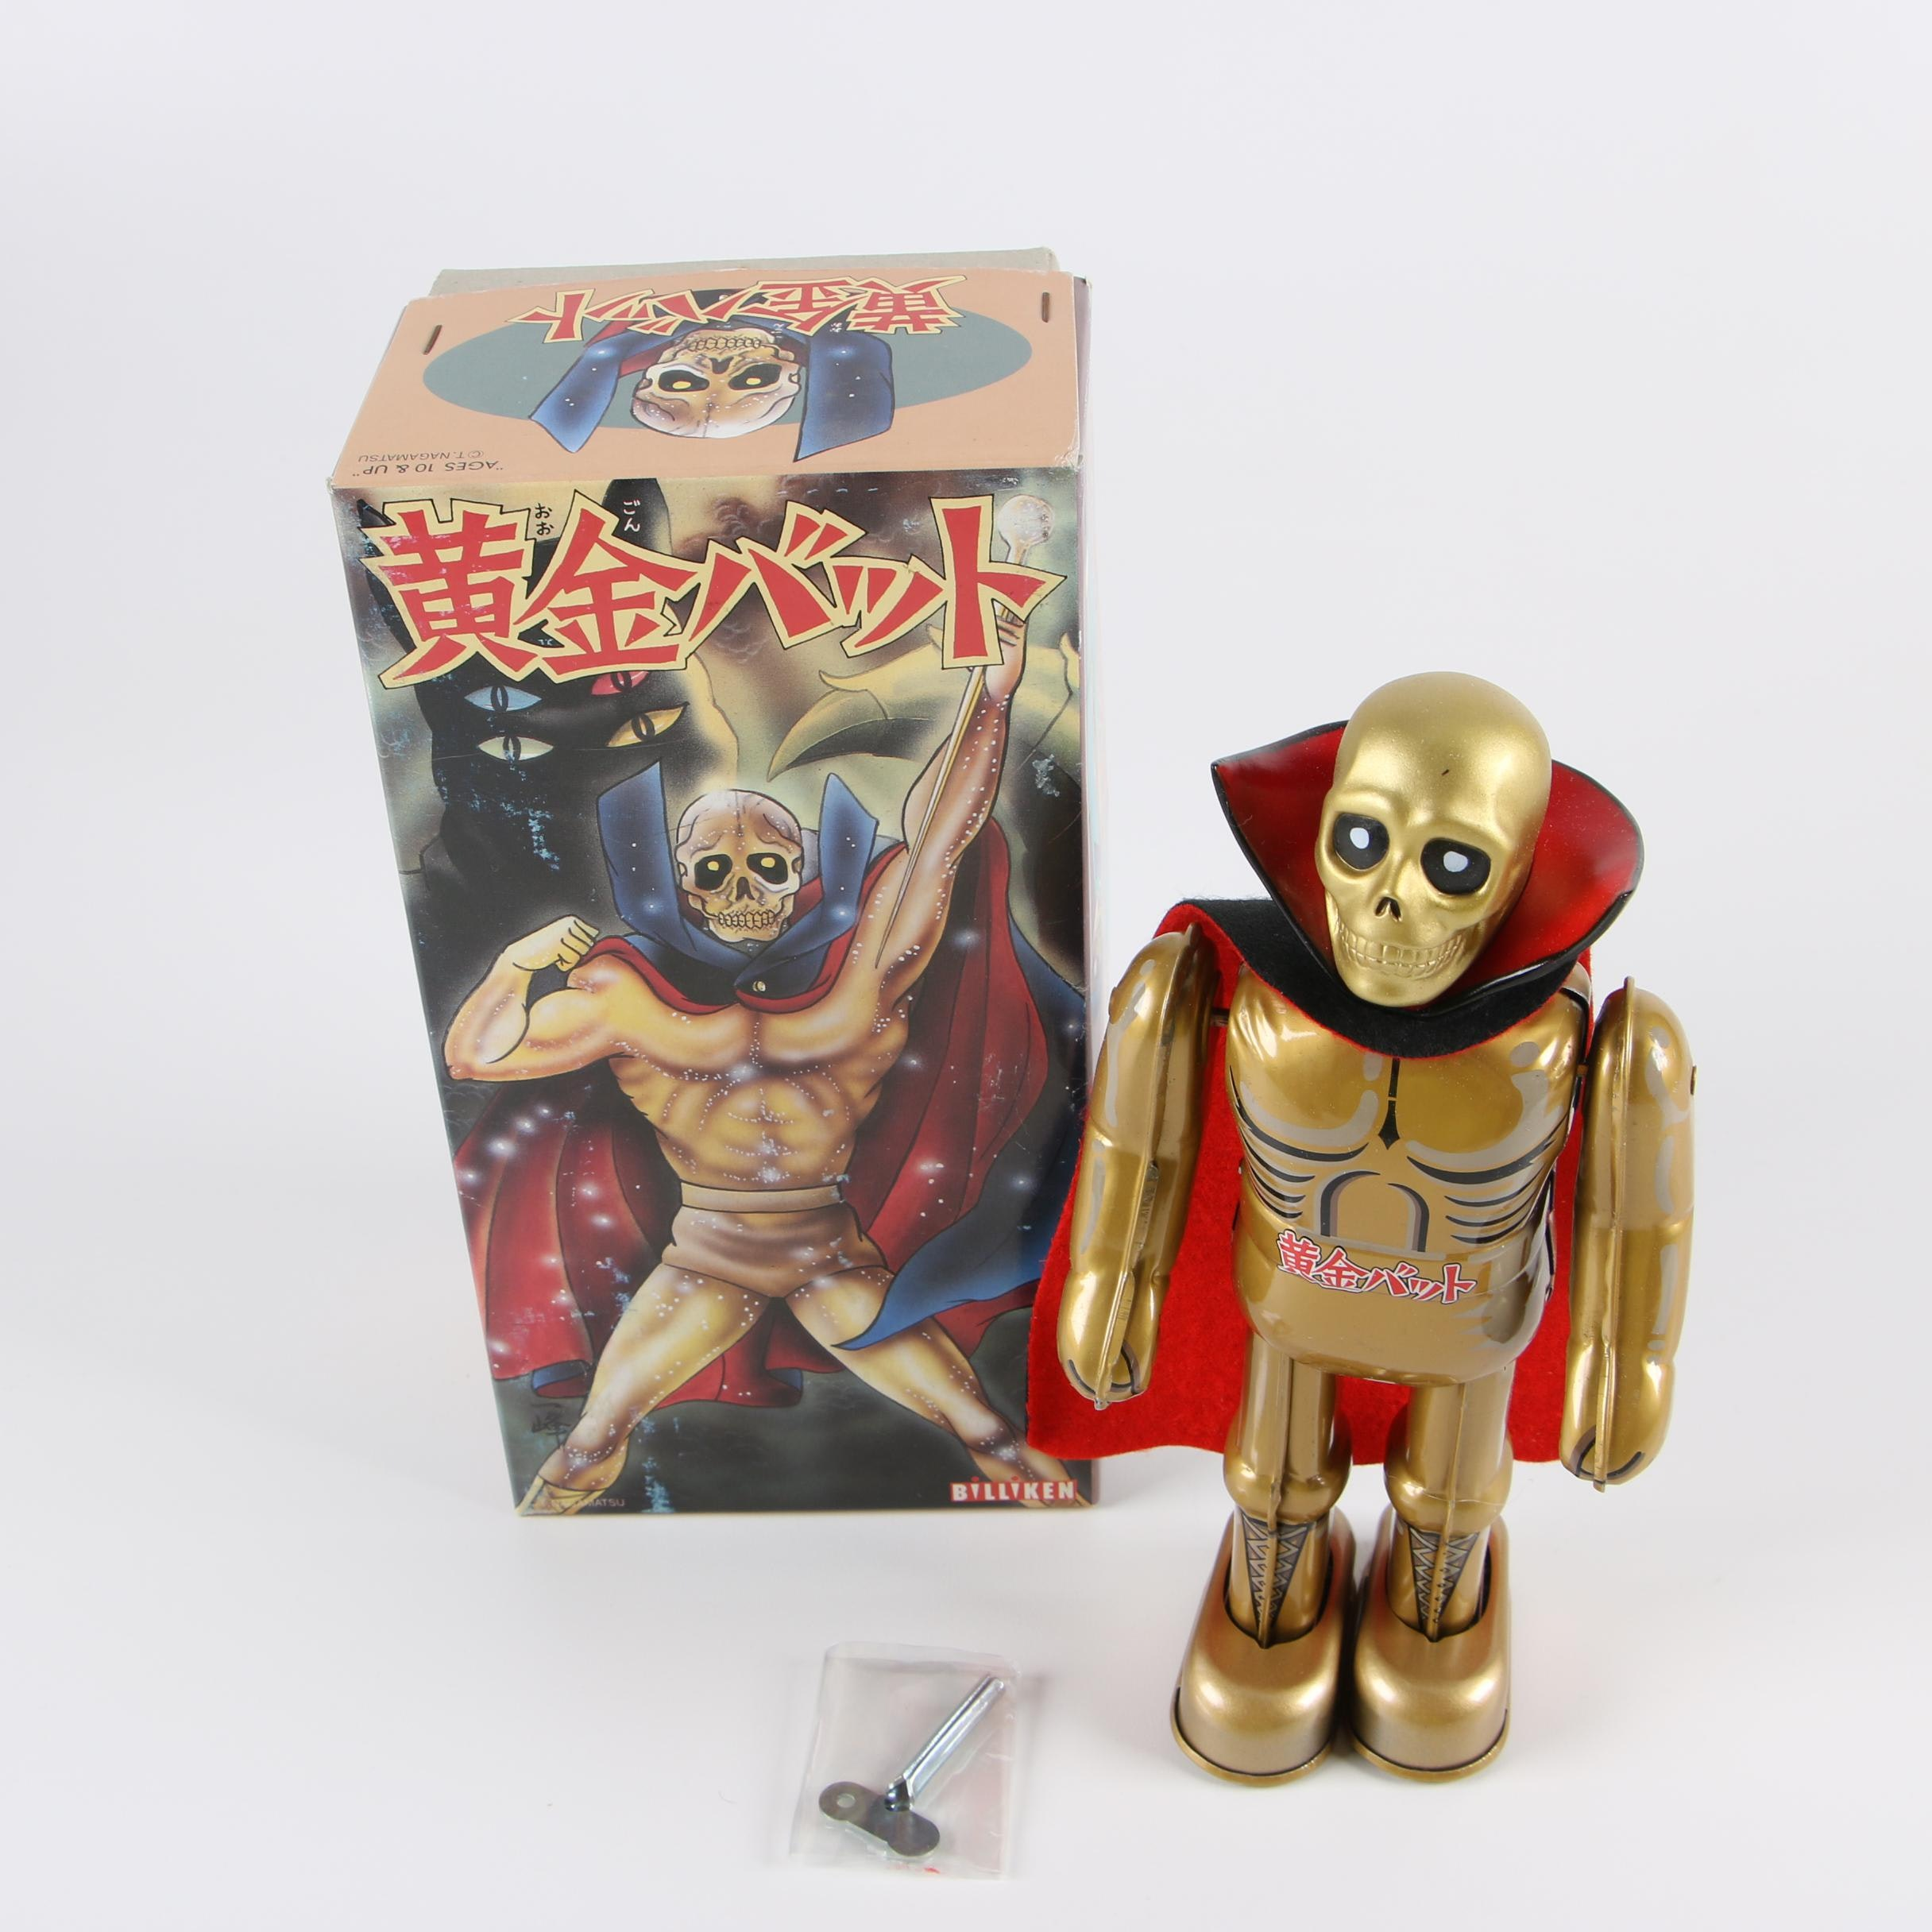 1990s Billiken Ōgon Bat Wind-up Toy